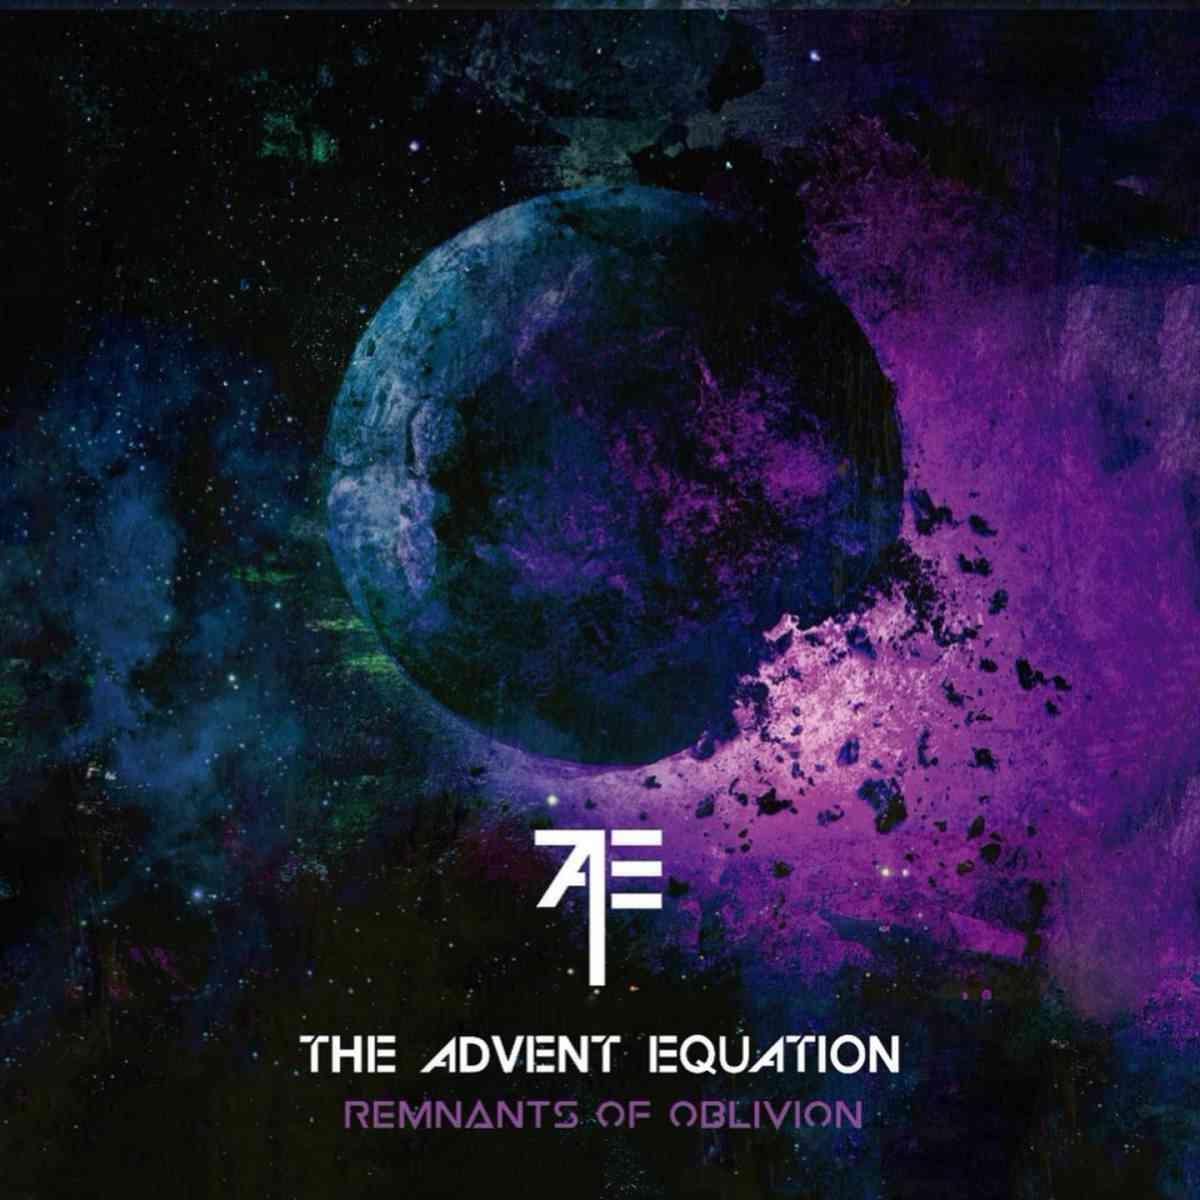 the advent equation - remnants of oblivion - album cove